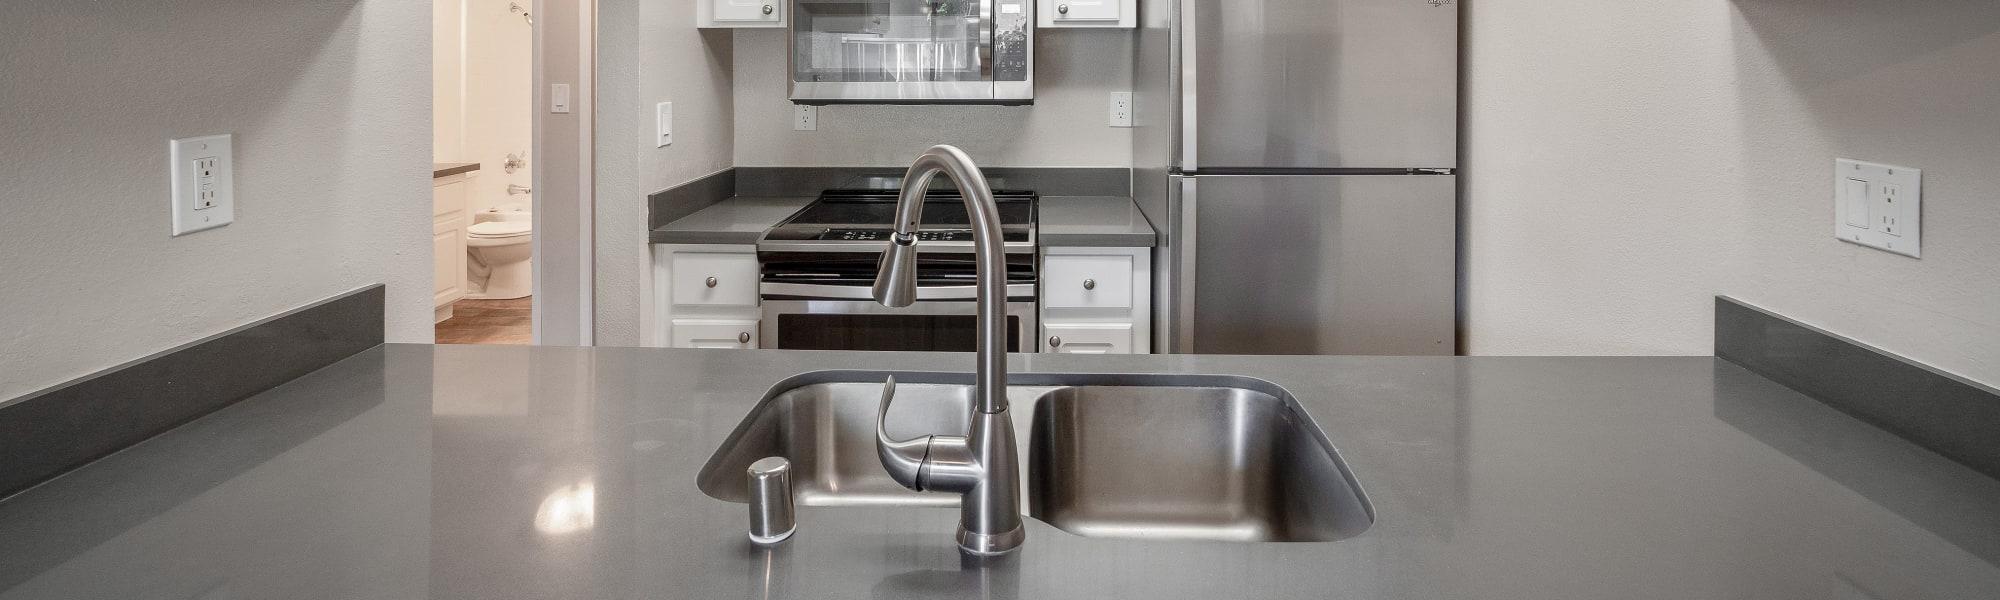 Floor plans at Valley Ridge Apartment Homes in Martinez, California